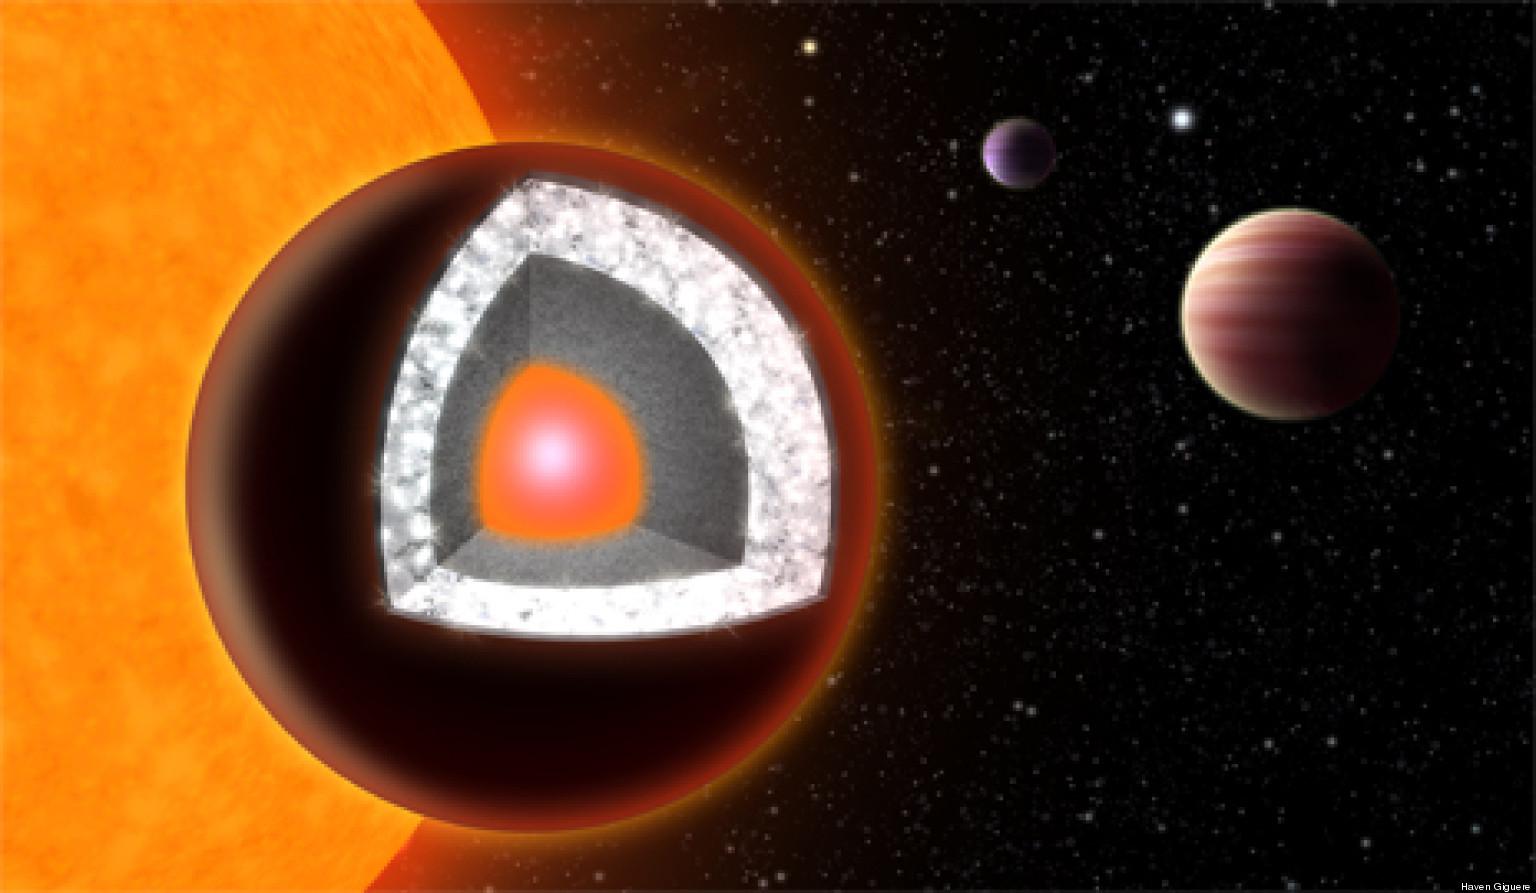 Diamond Planet '55 Cancri E' Orbits Sunlike Star 40